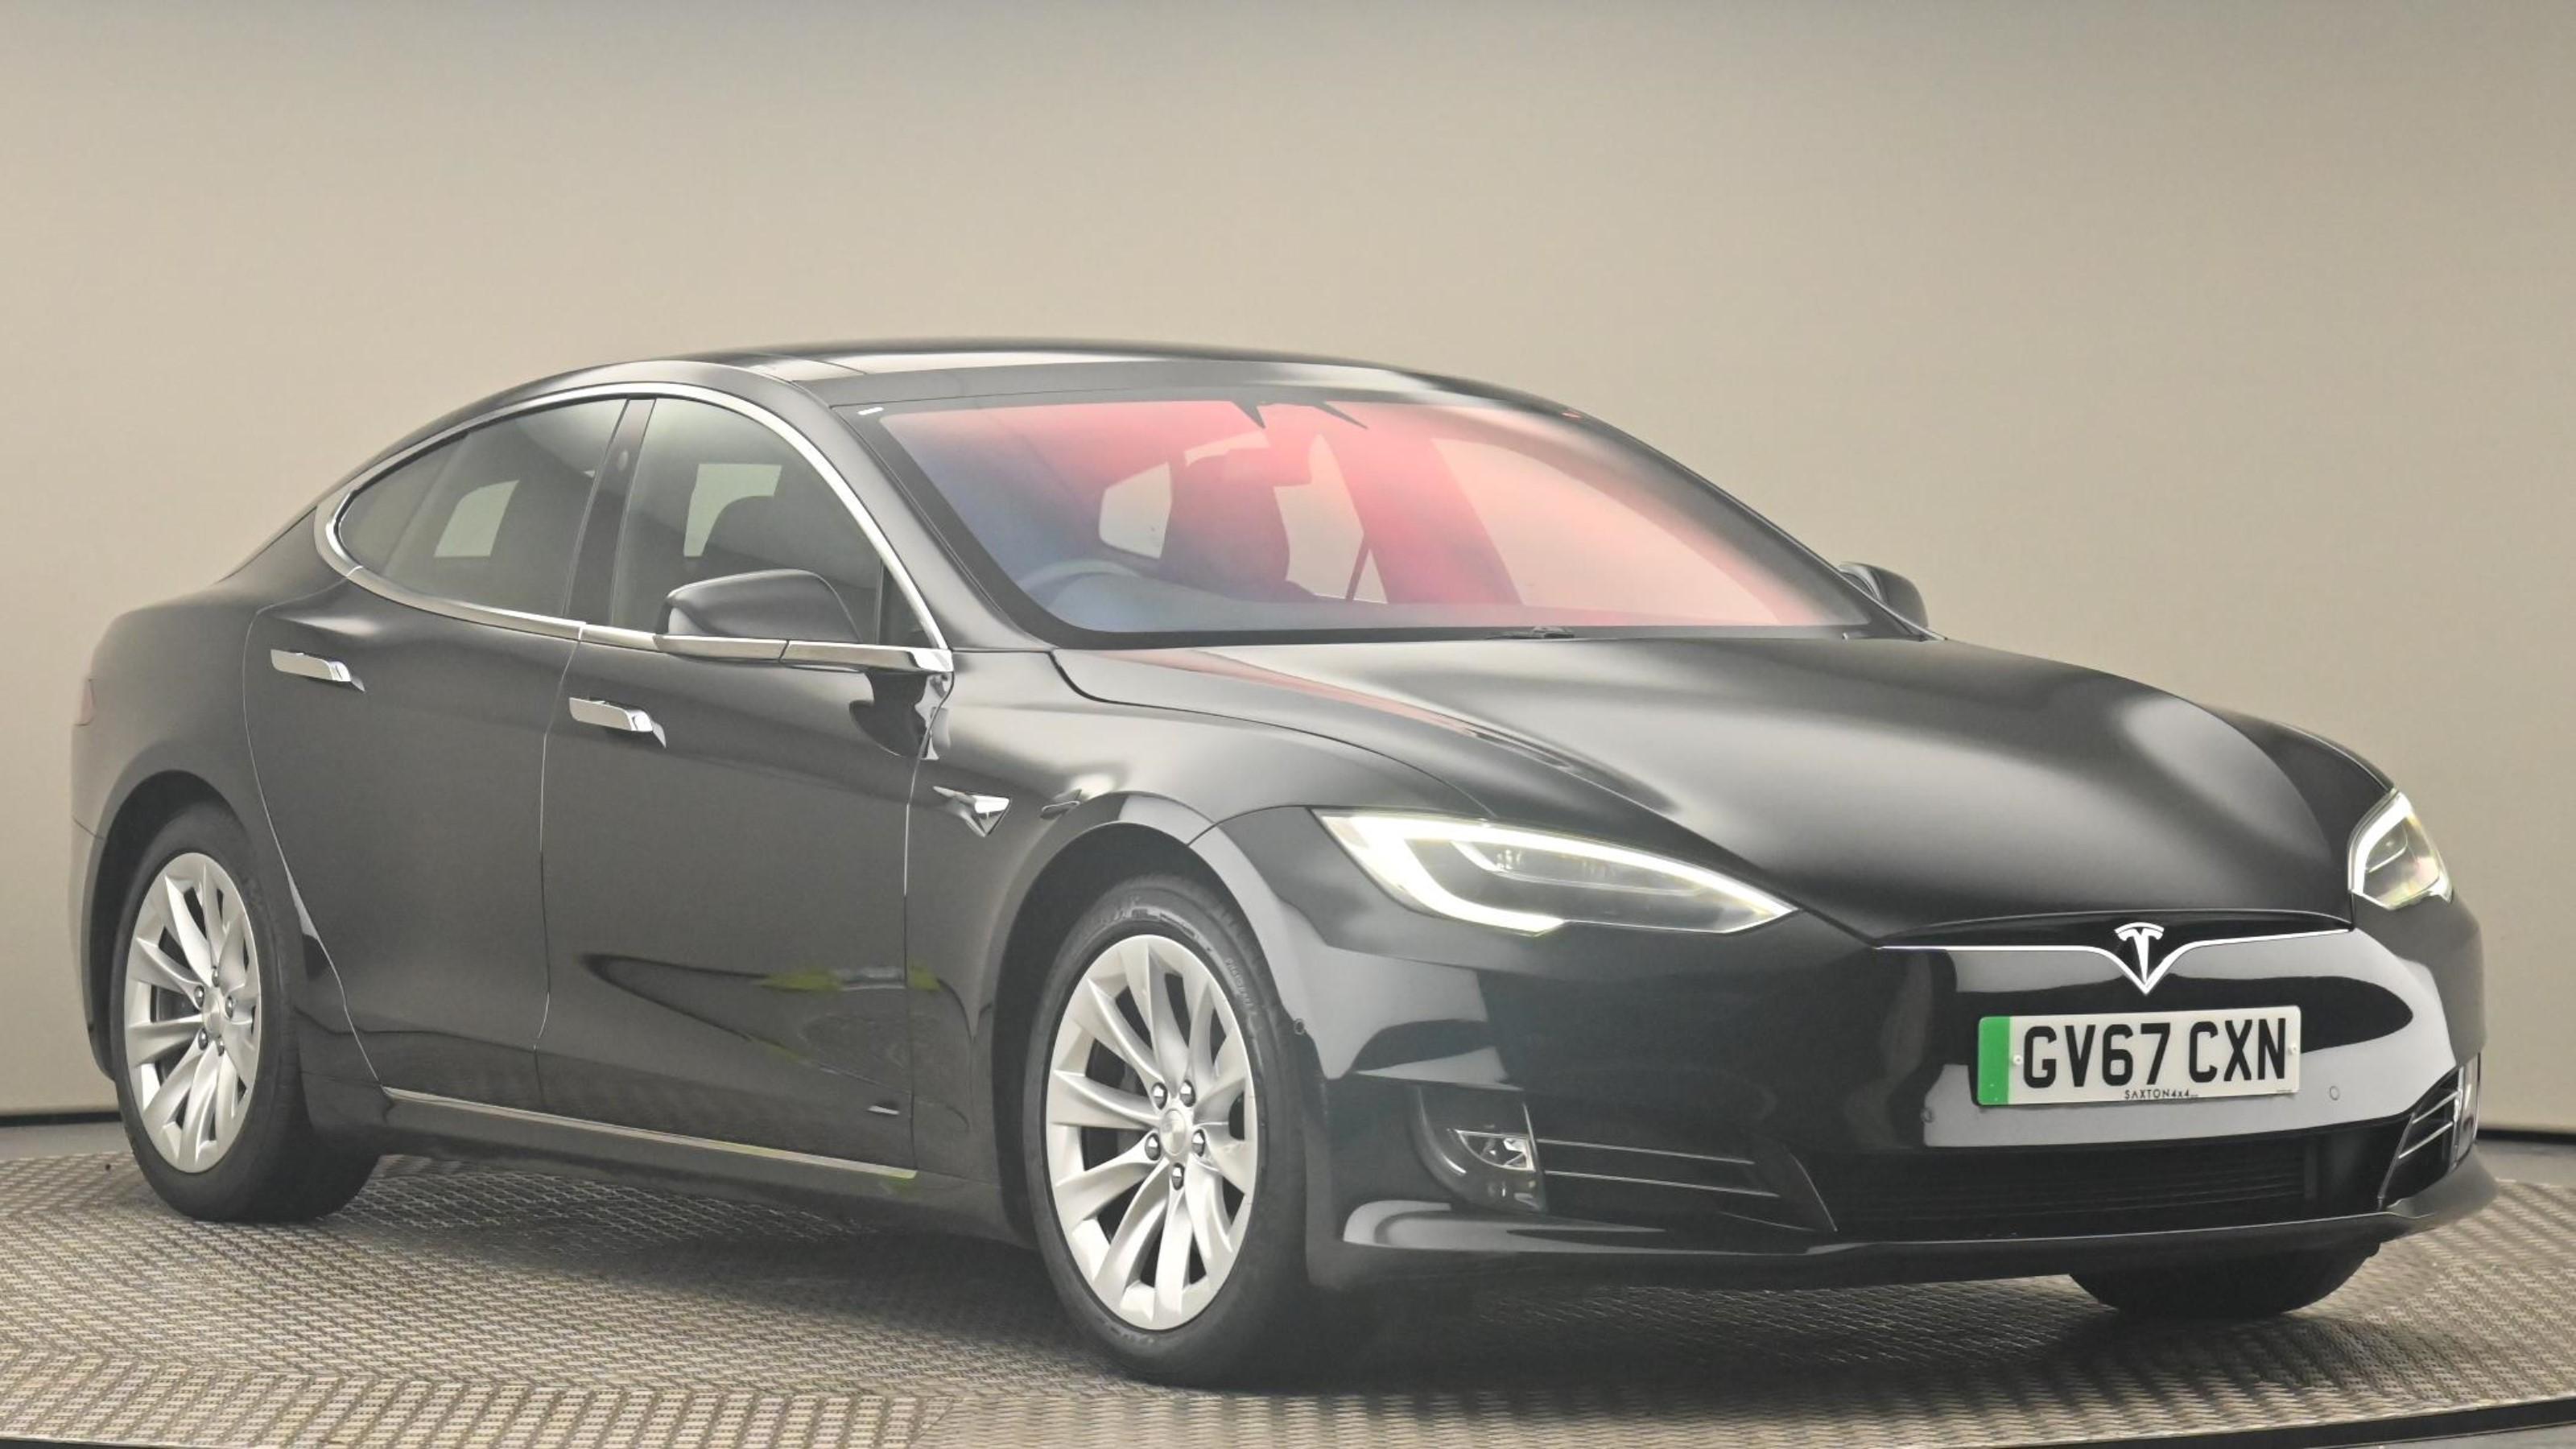 Used 2018 Tesla MODEL S 449kW 100kWh Dual Motor 5dr Auto BLACK at Saxton4x4